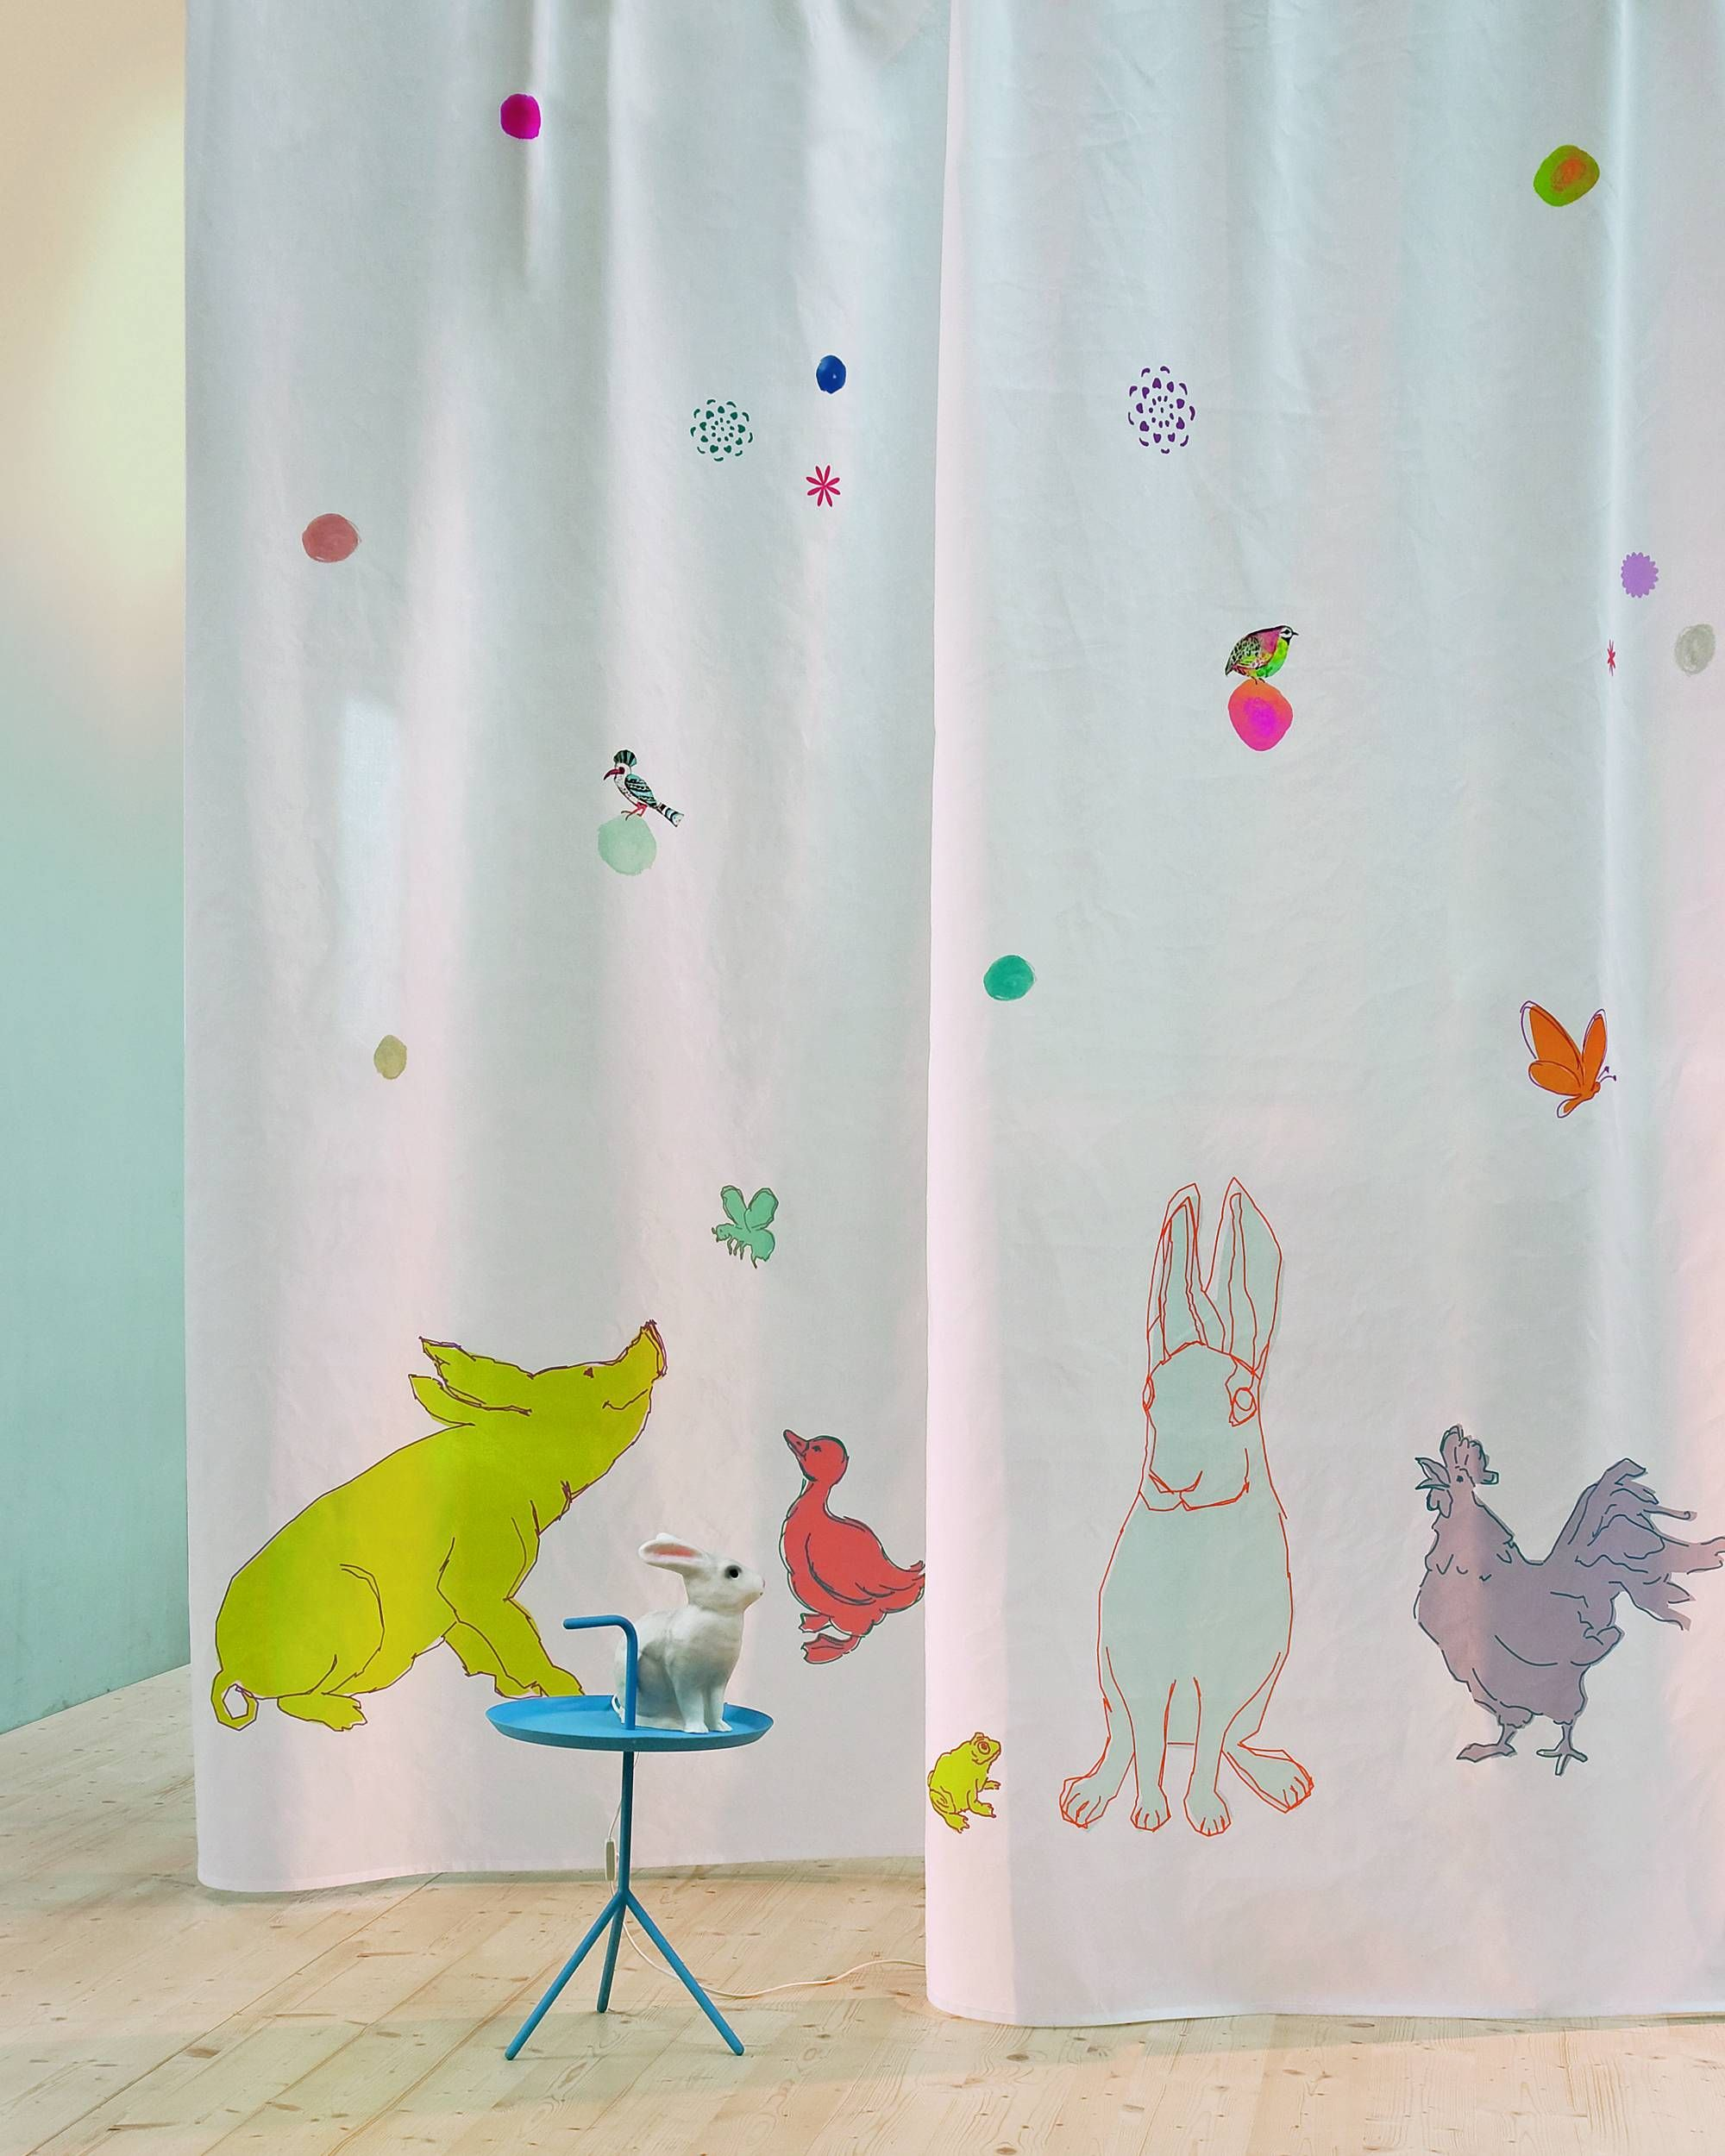 Pin by Lei Kaddzo on Hospital designs Curtains, Hospital